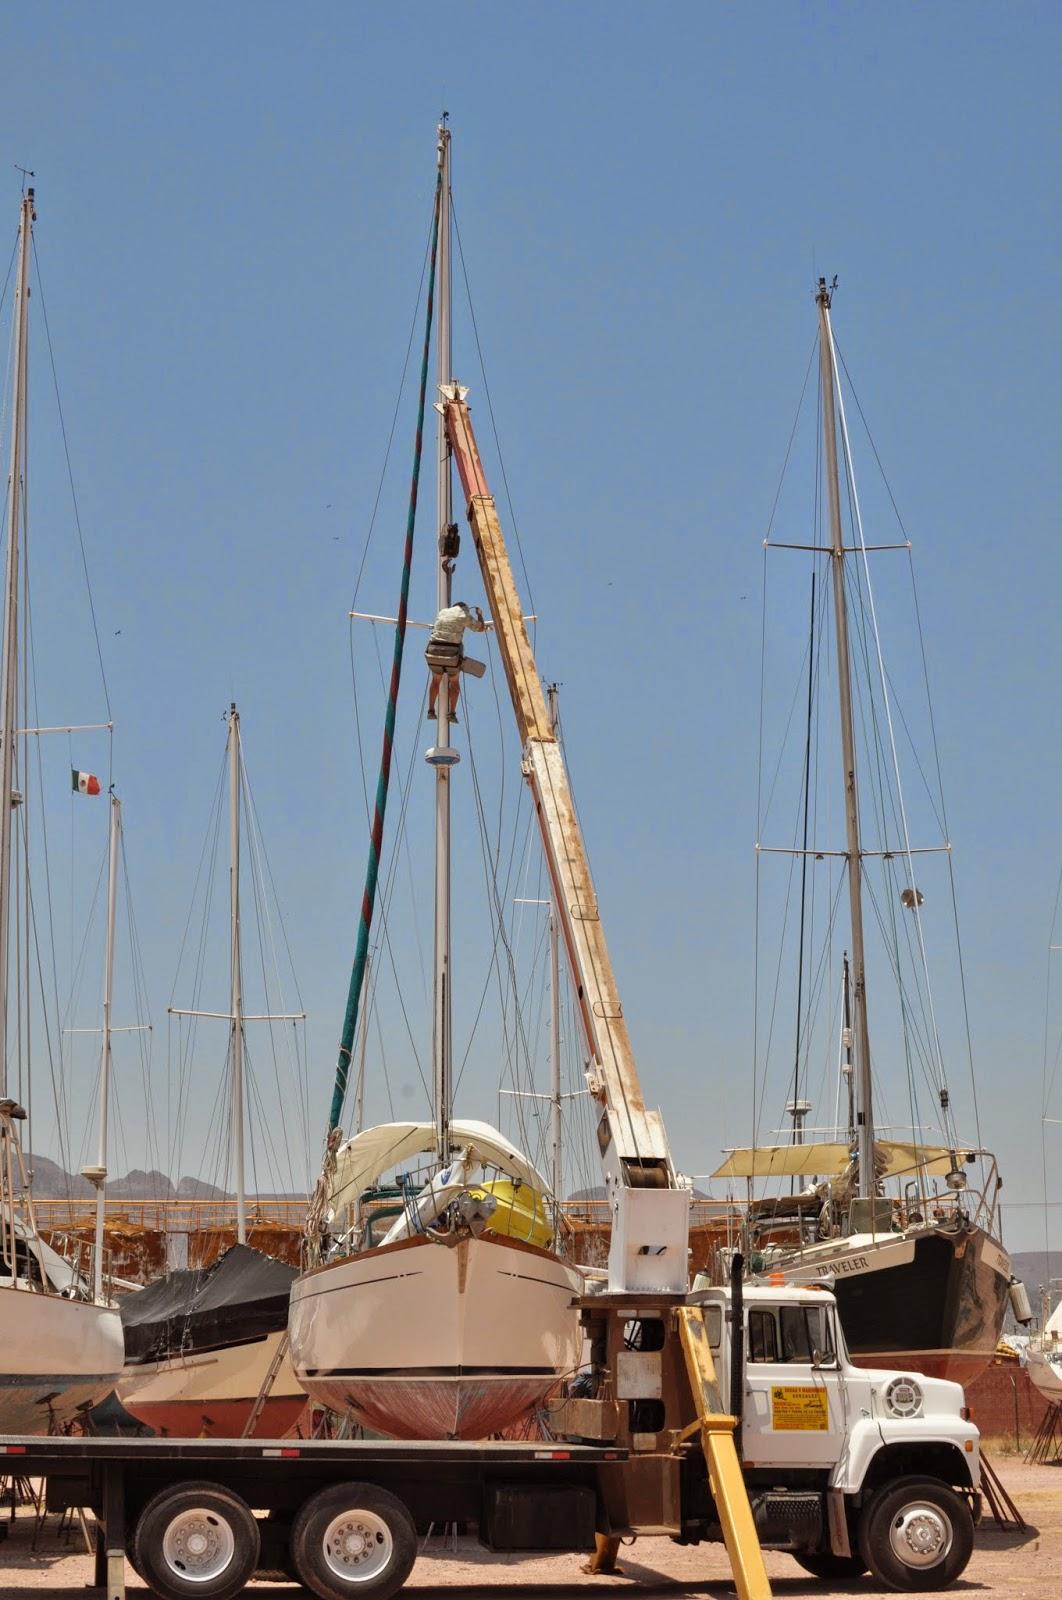 Pulling Del Viento's Mast